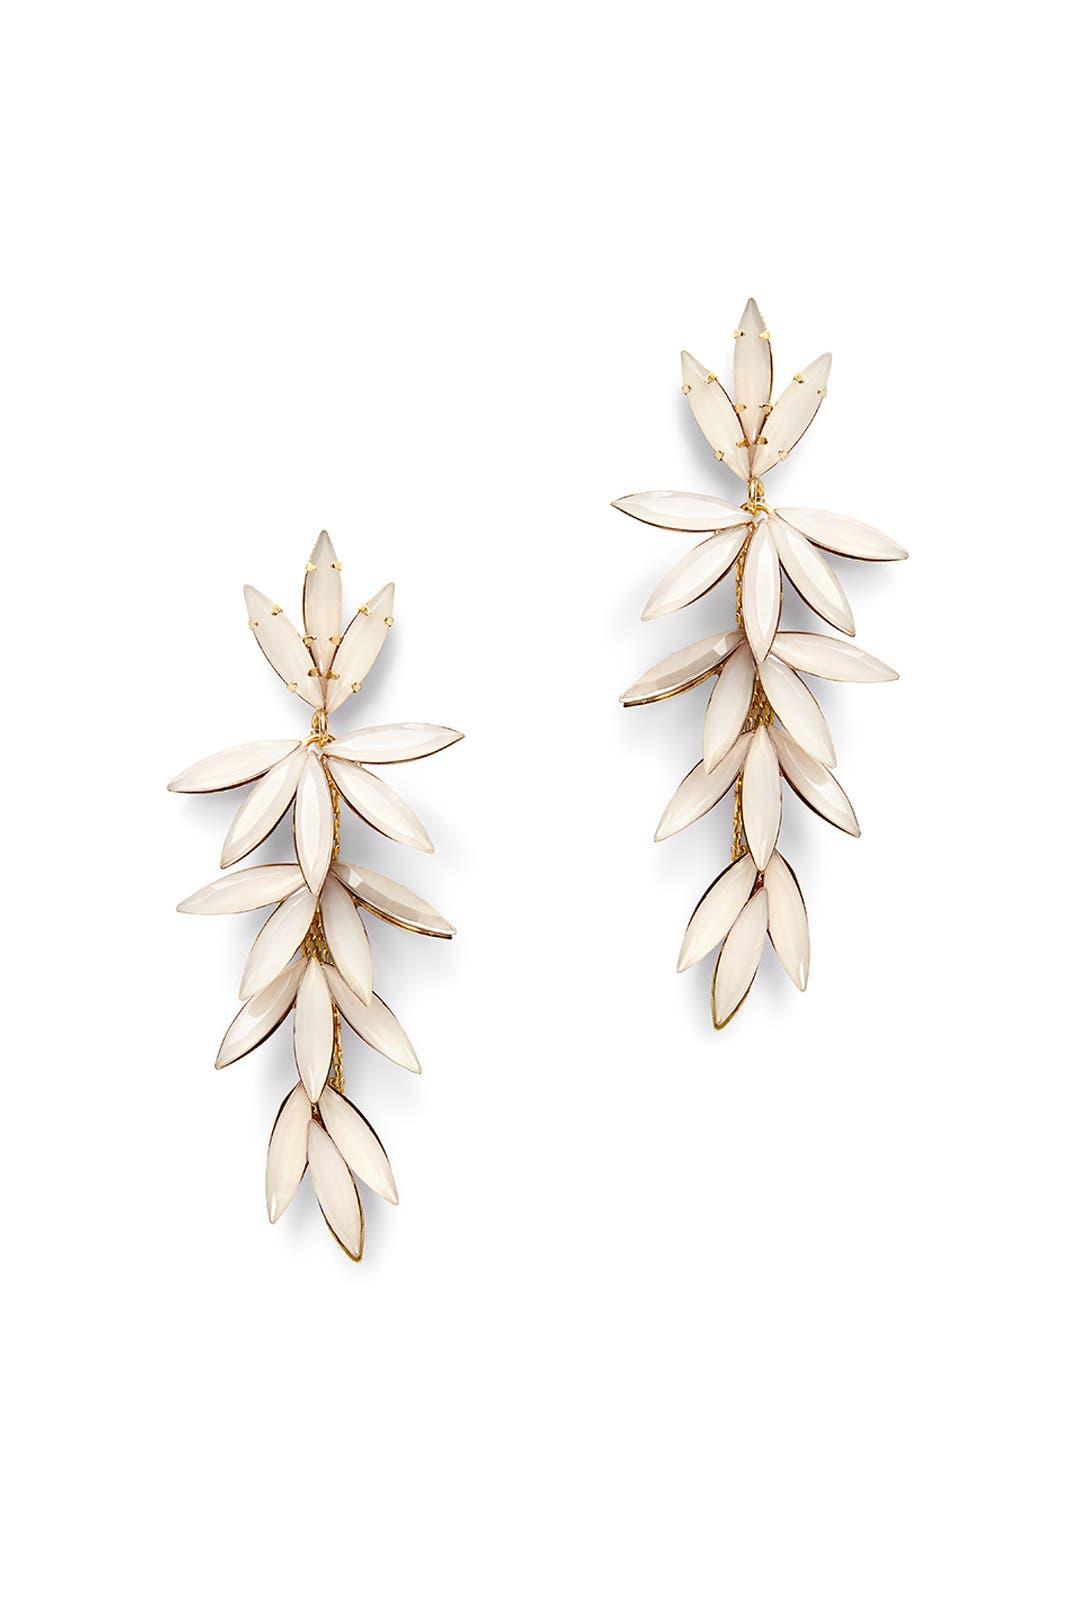 Blush Thorn Earrings by RJ Graziano